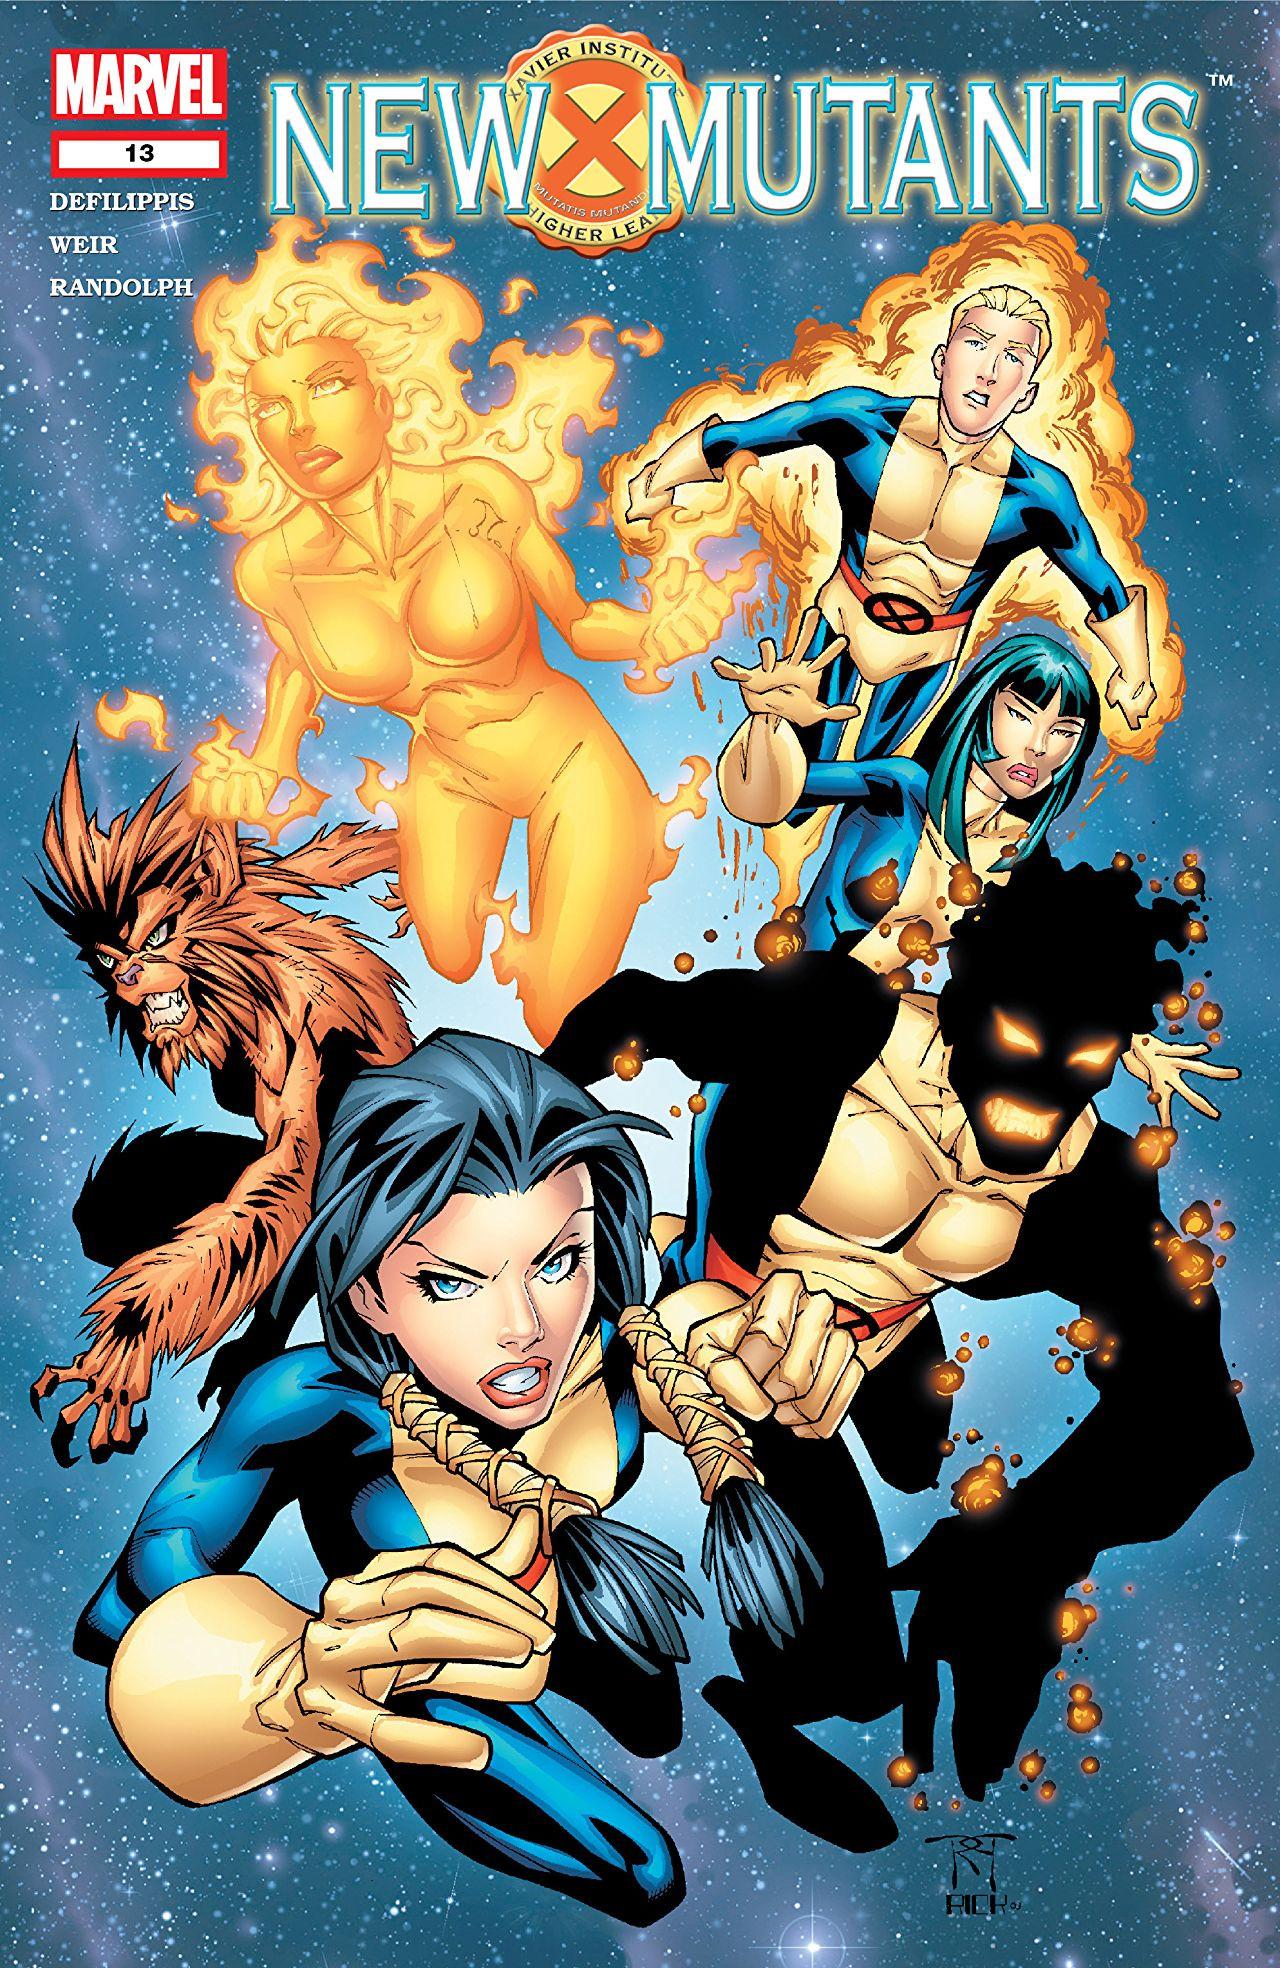 New Mutants Vol 2 13